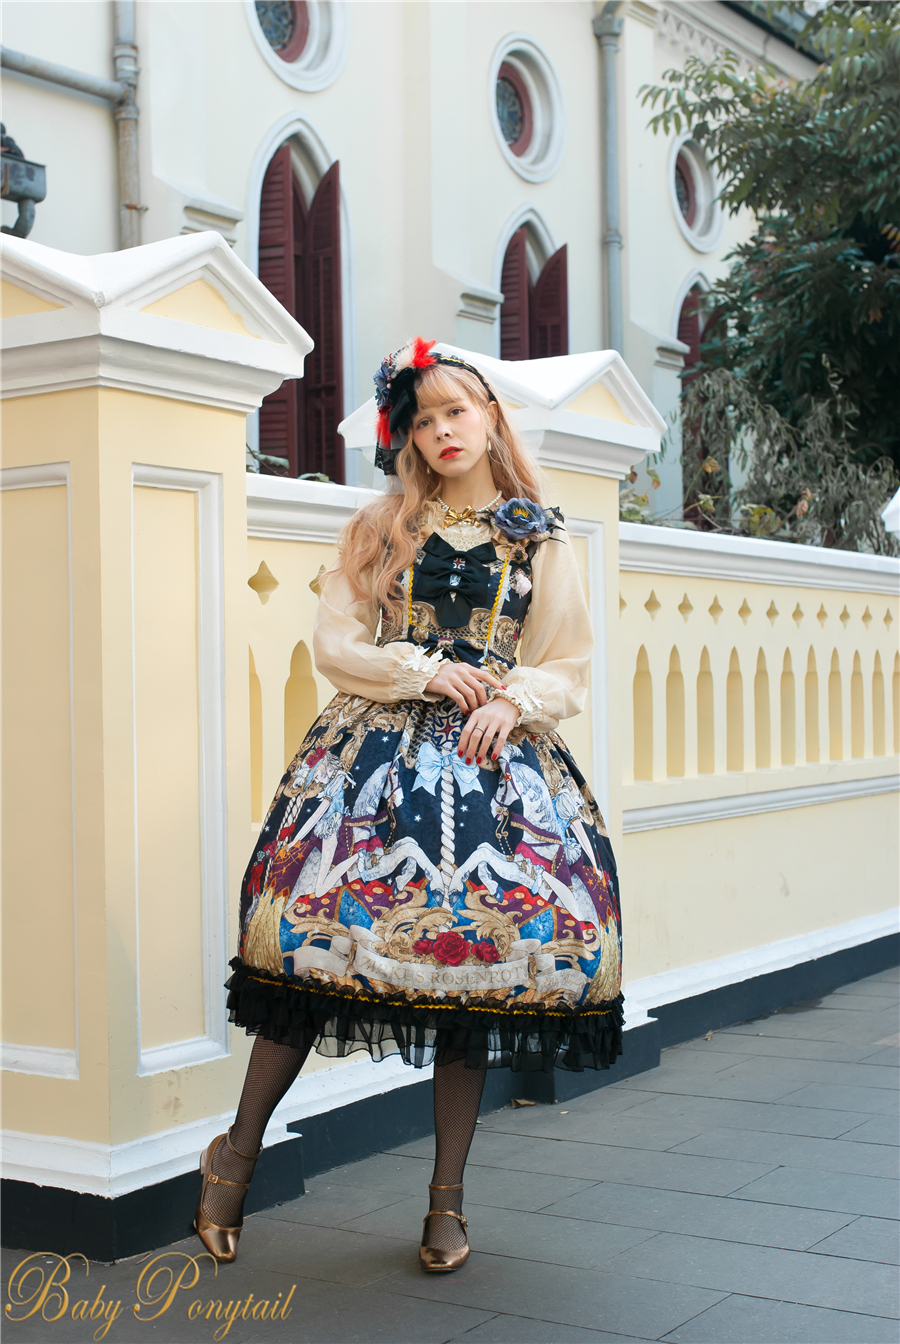 Baby Ponytail_Circus Princess_Black JSK_Claudia_09.jpg